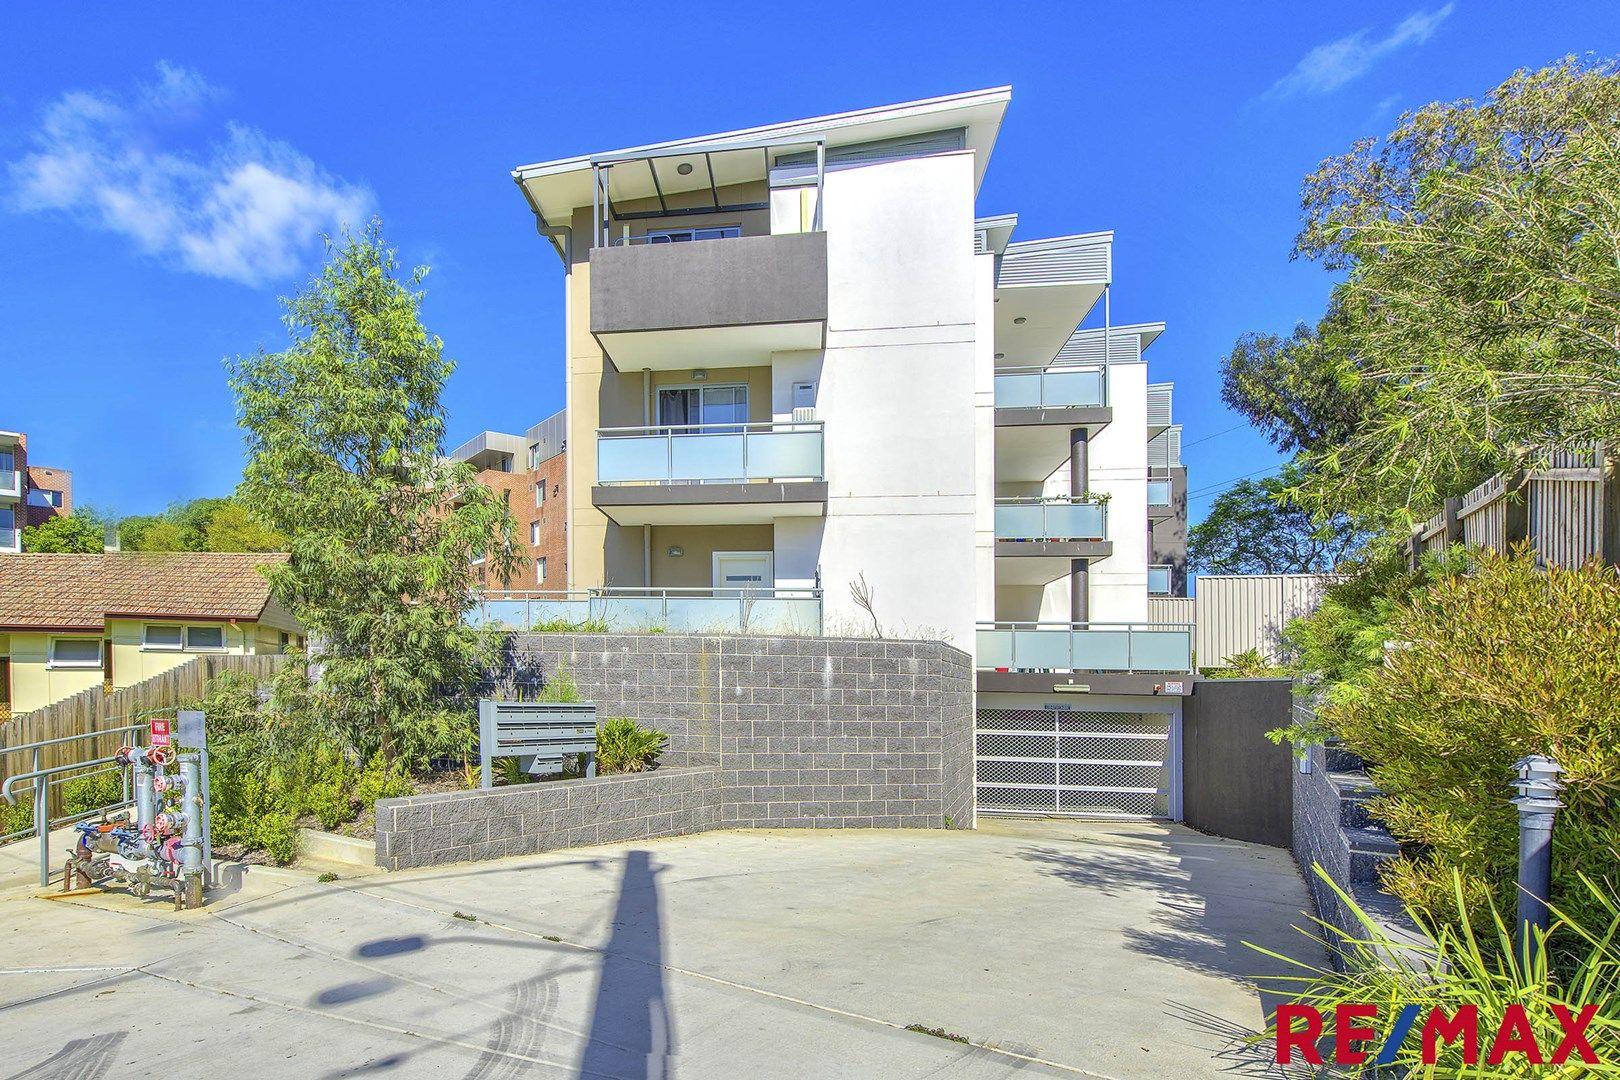 6 / 8 FIELD PLACE, Telopea NSW 2117, Image 0